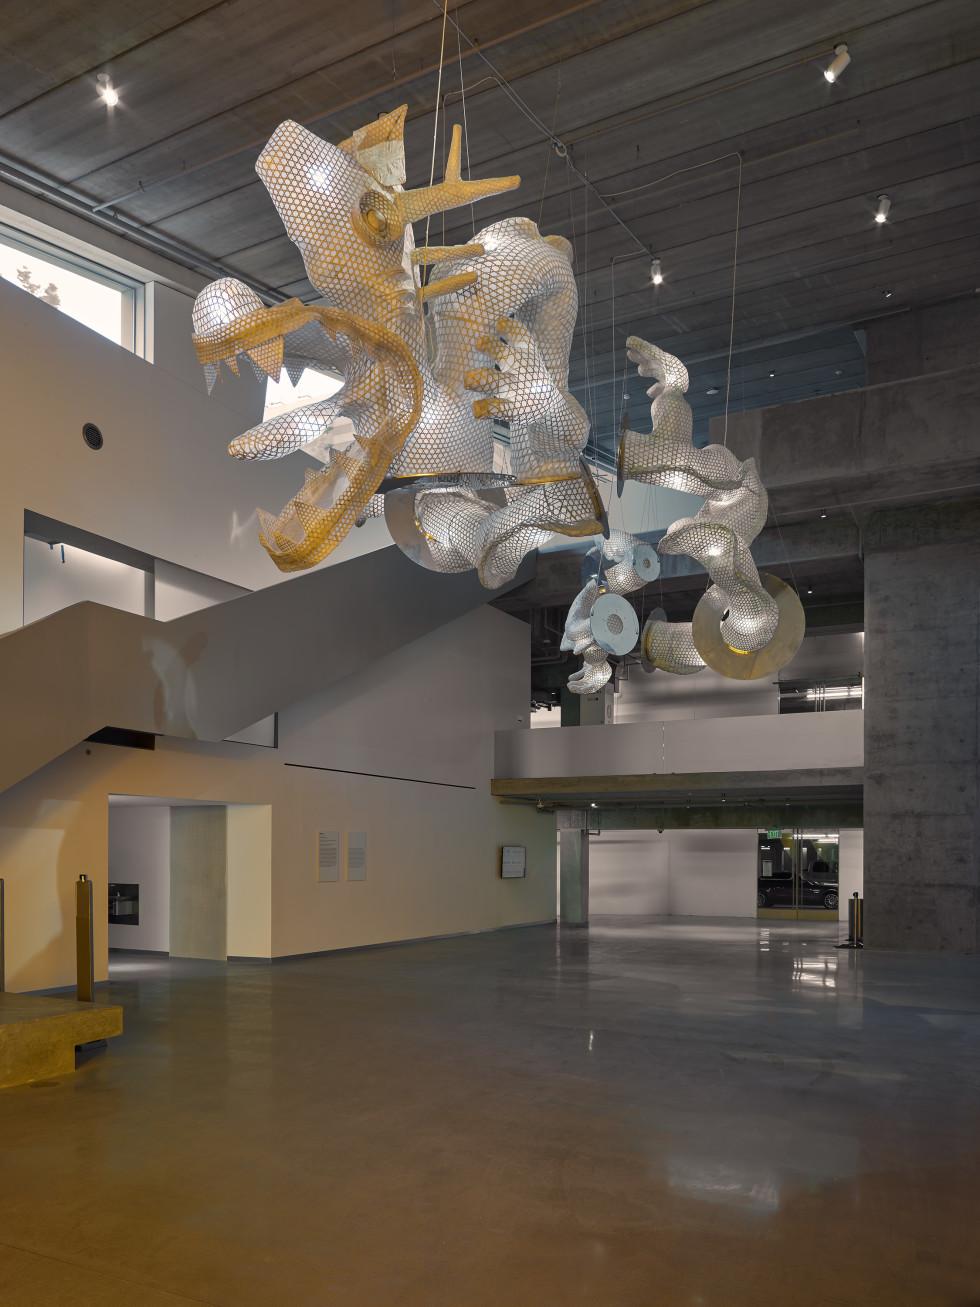 MFAH Nancy and Rich Kinder Building Ai Weiwei's Dragon Reflection